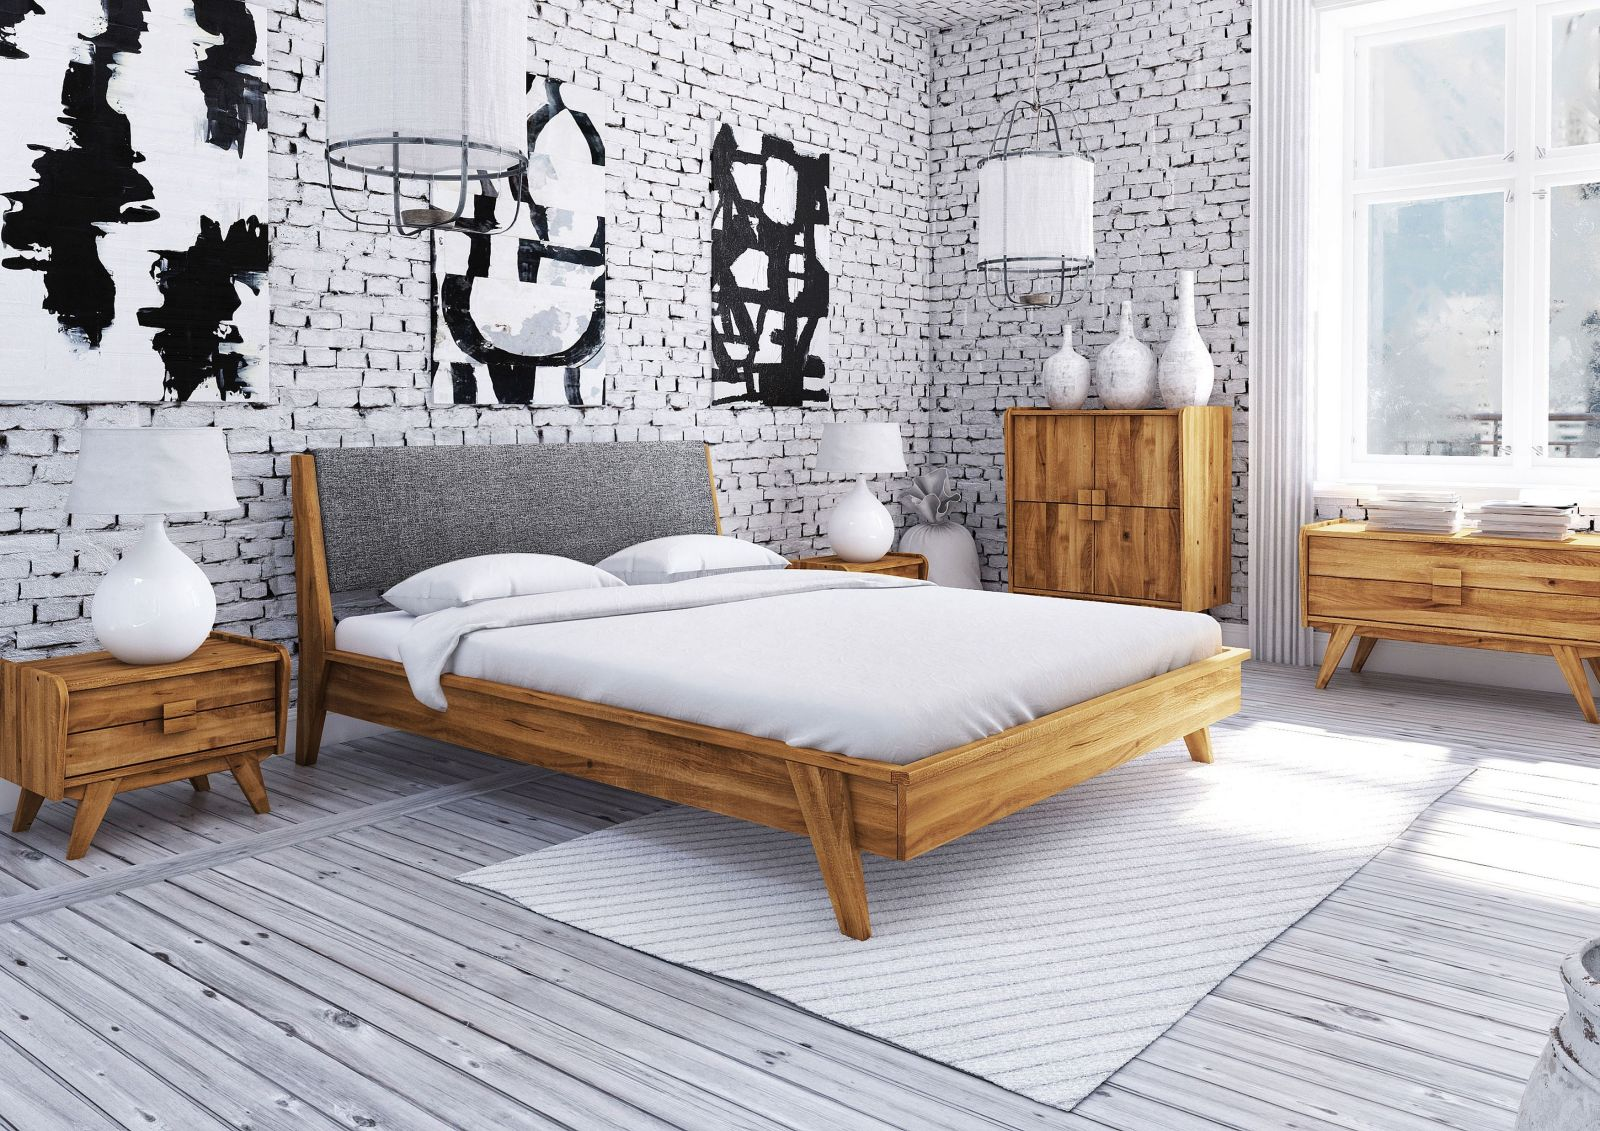 Full Size of 160x200 Bett Retro Versandfrei Kaufen Massivmoebel24 200x200 Mit Bettkasten Komforthöhe Paidi Dormiente 120 Betten überlänge Ausziehbett Stauraum 140x200 Bett 160x200 Bett